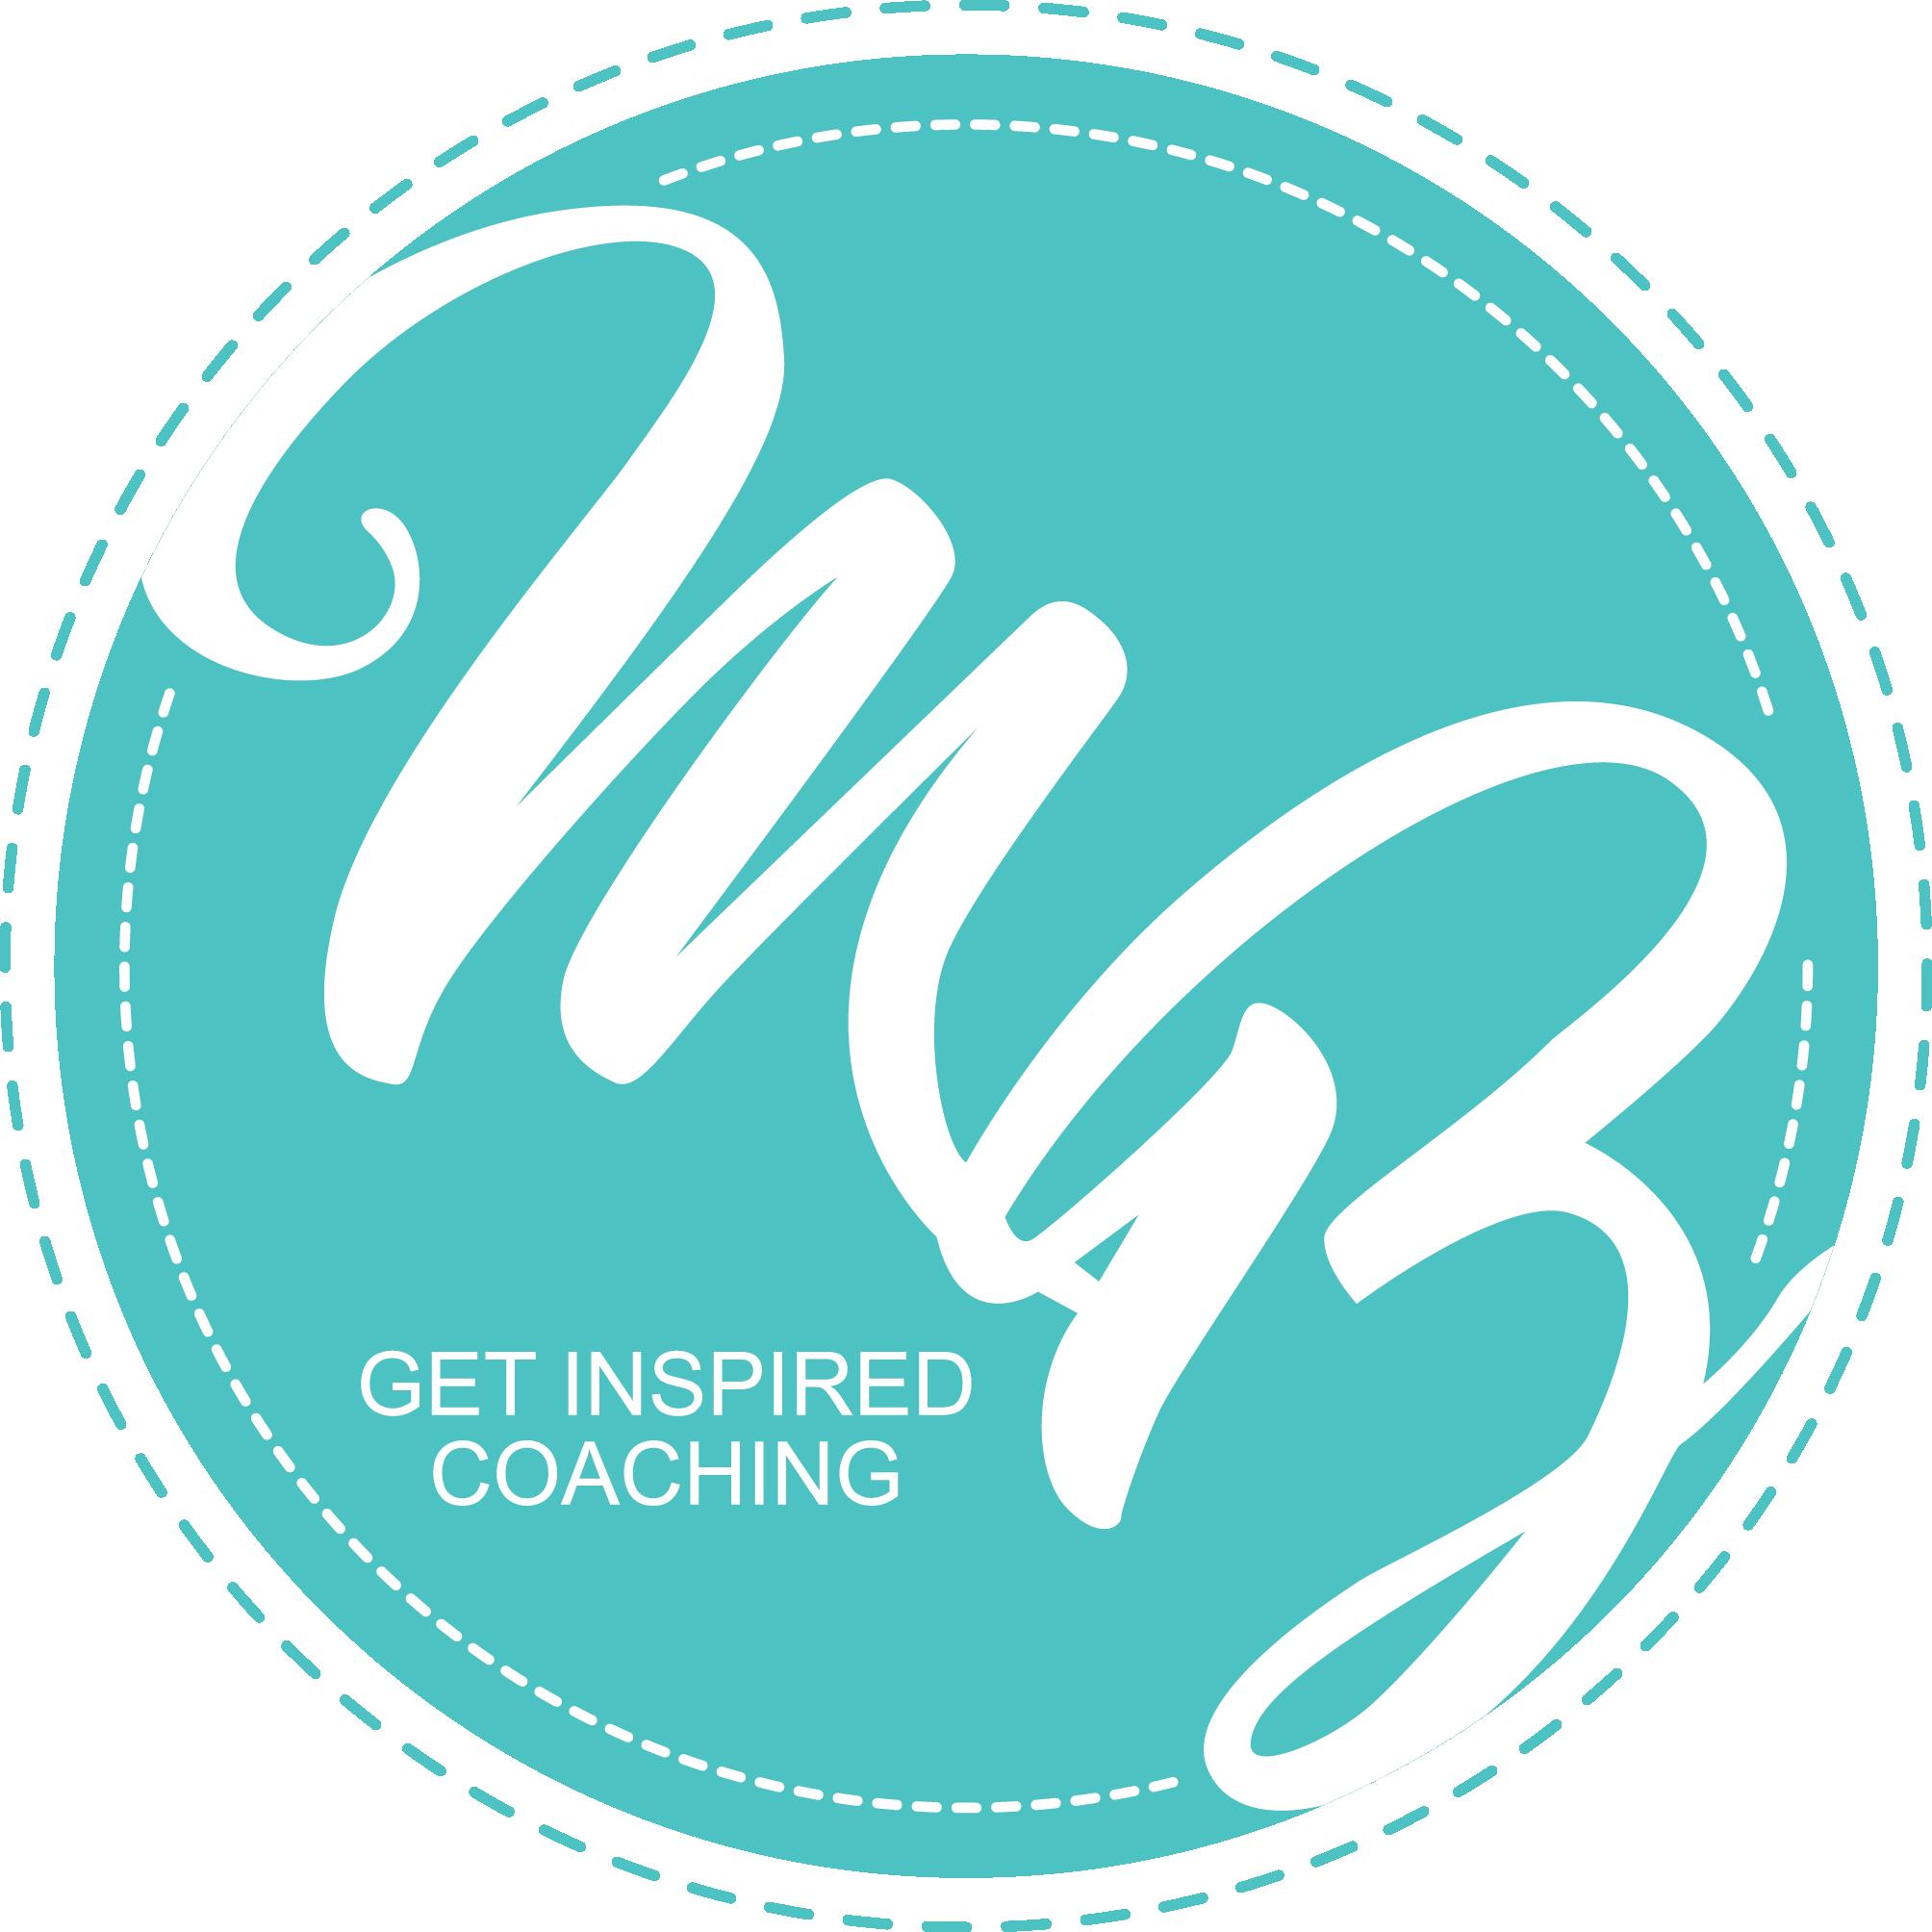 Get Inspired Coaching